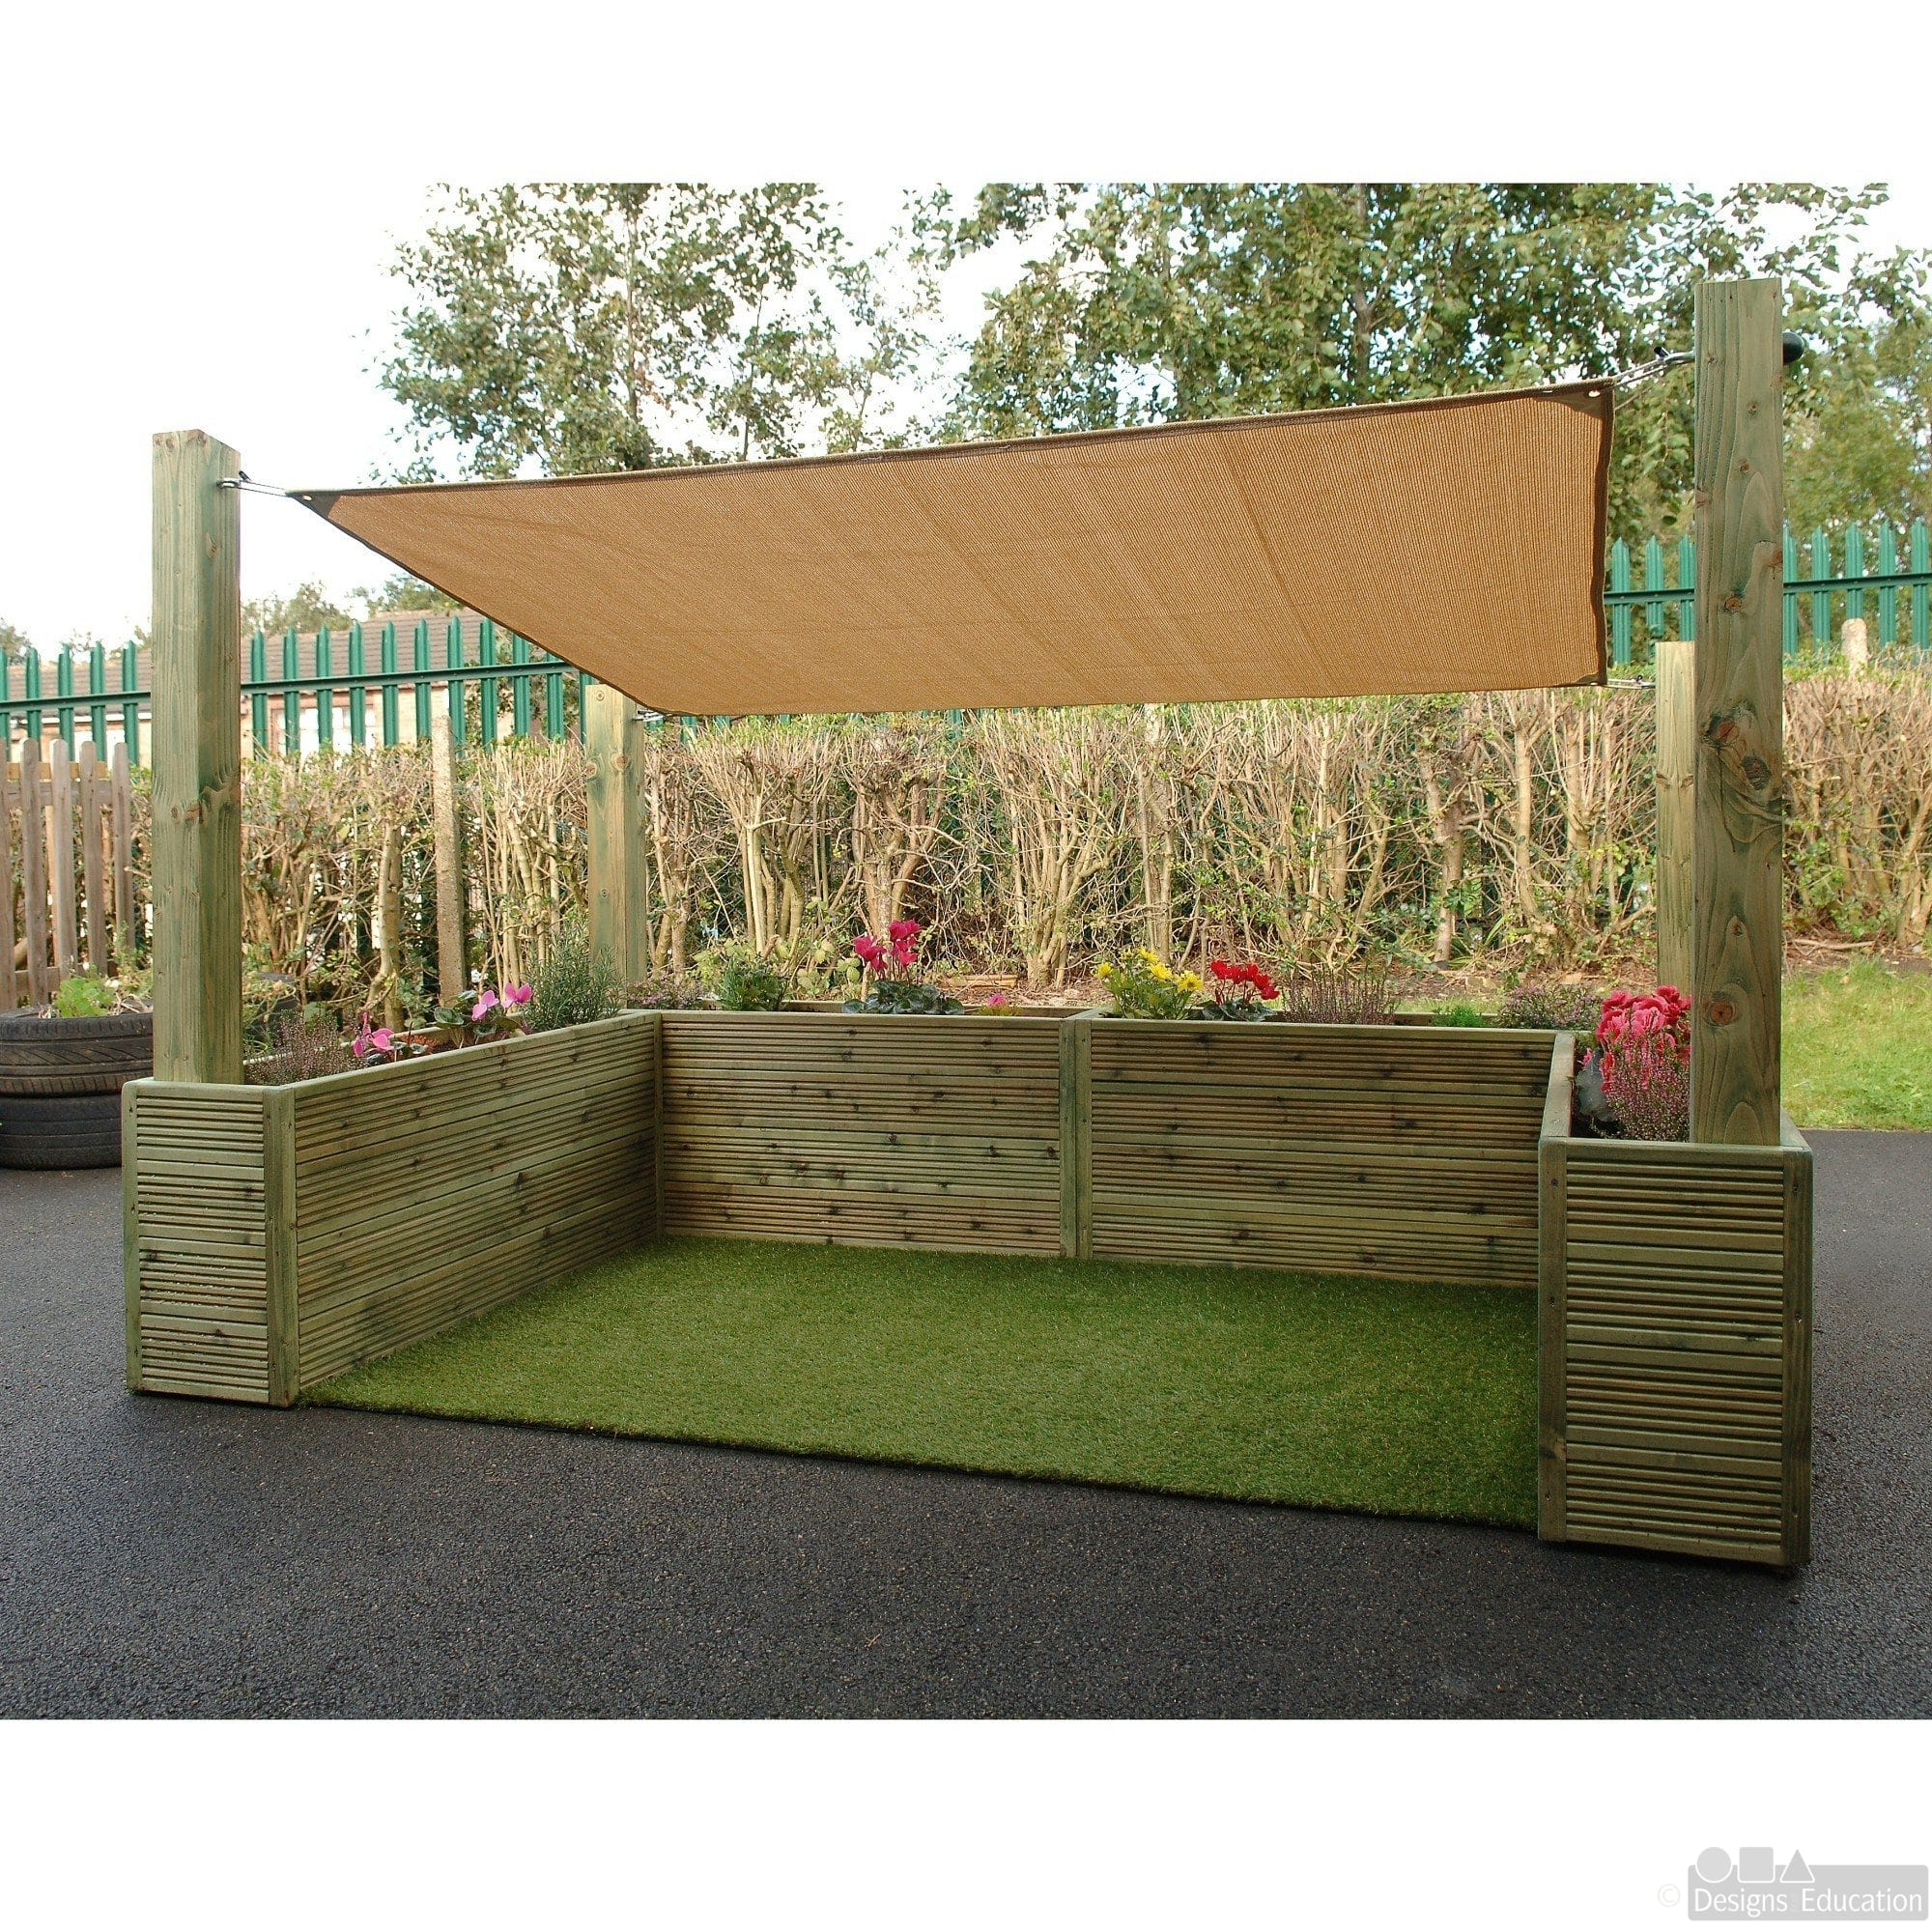 Sensory Cosy Garden - Designs For Education